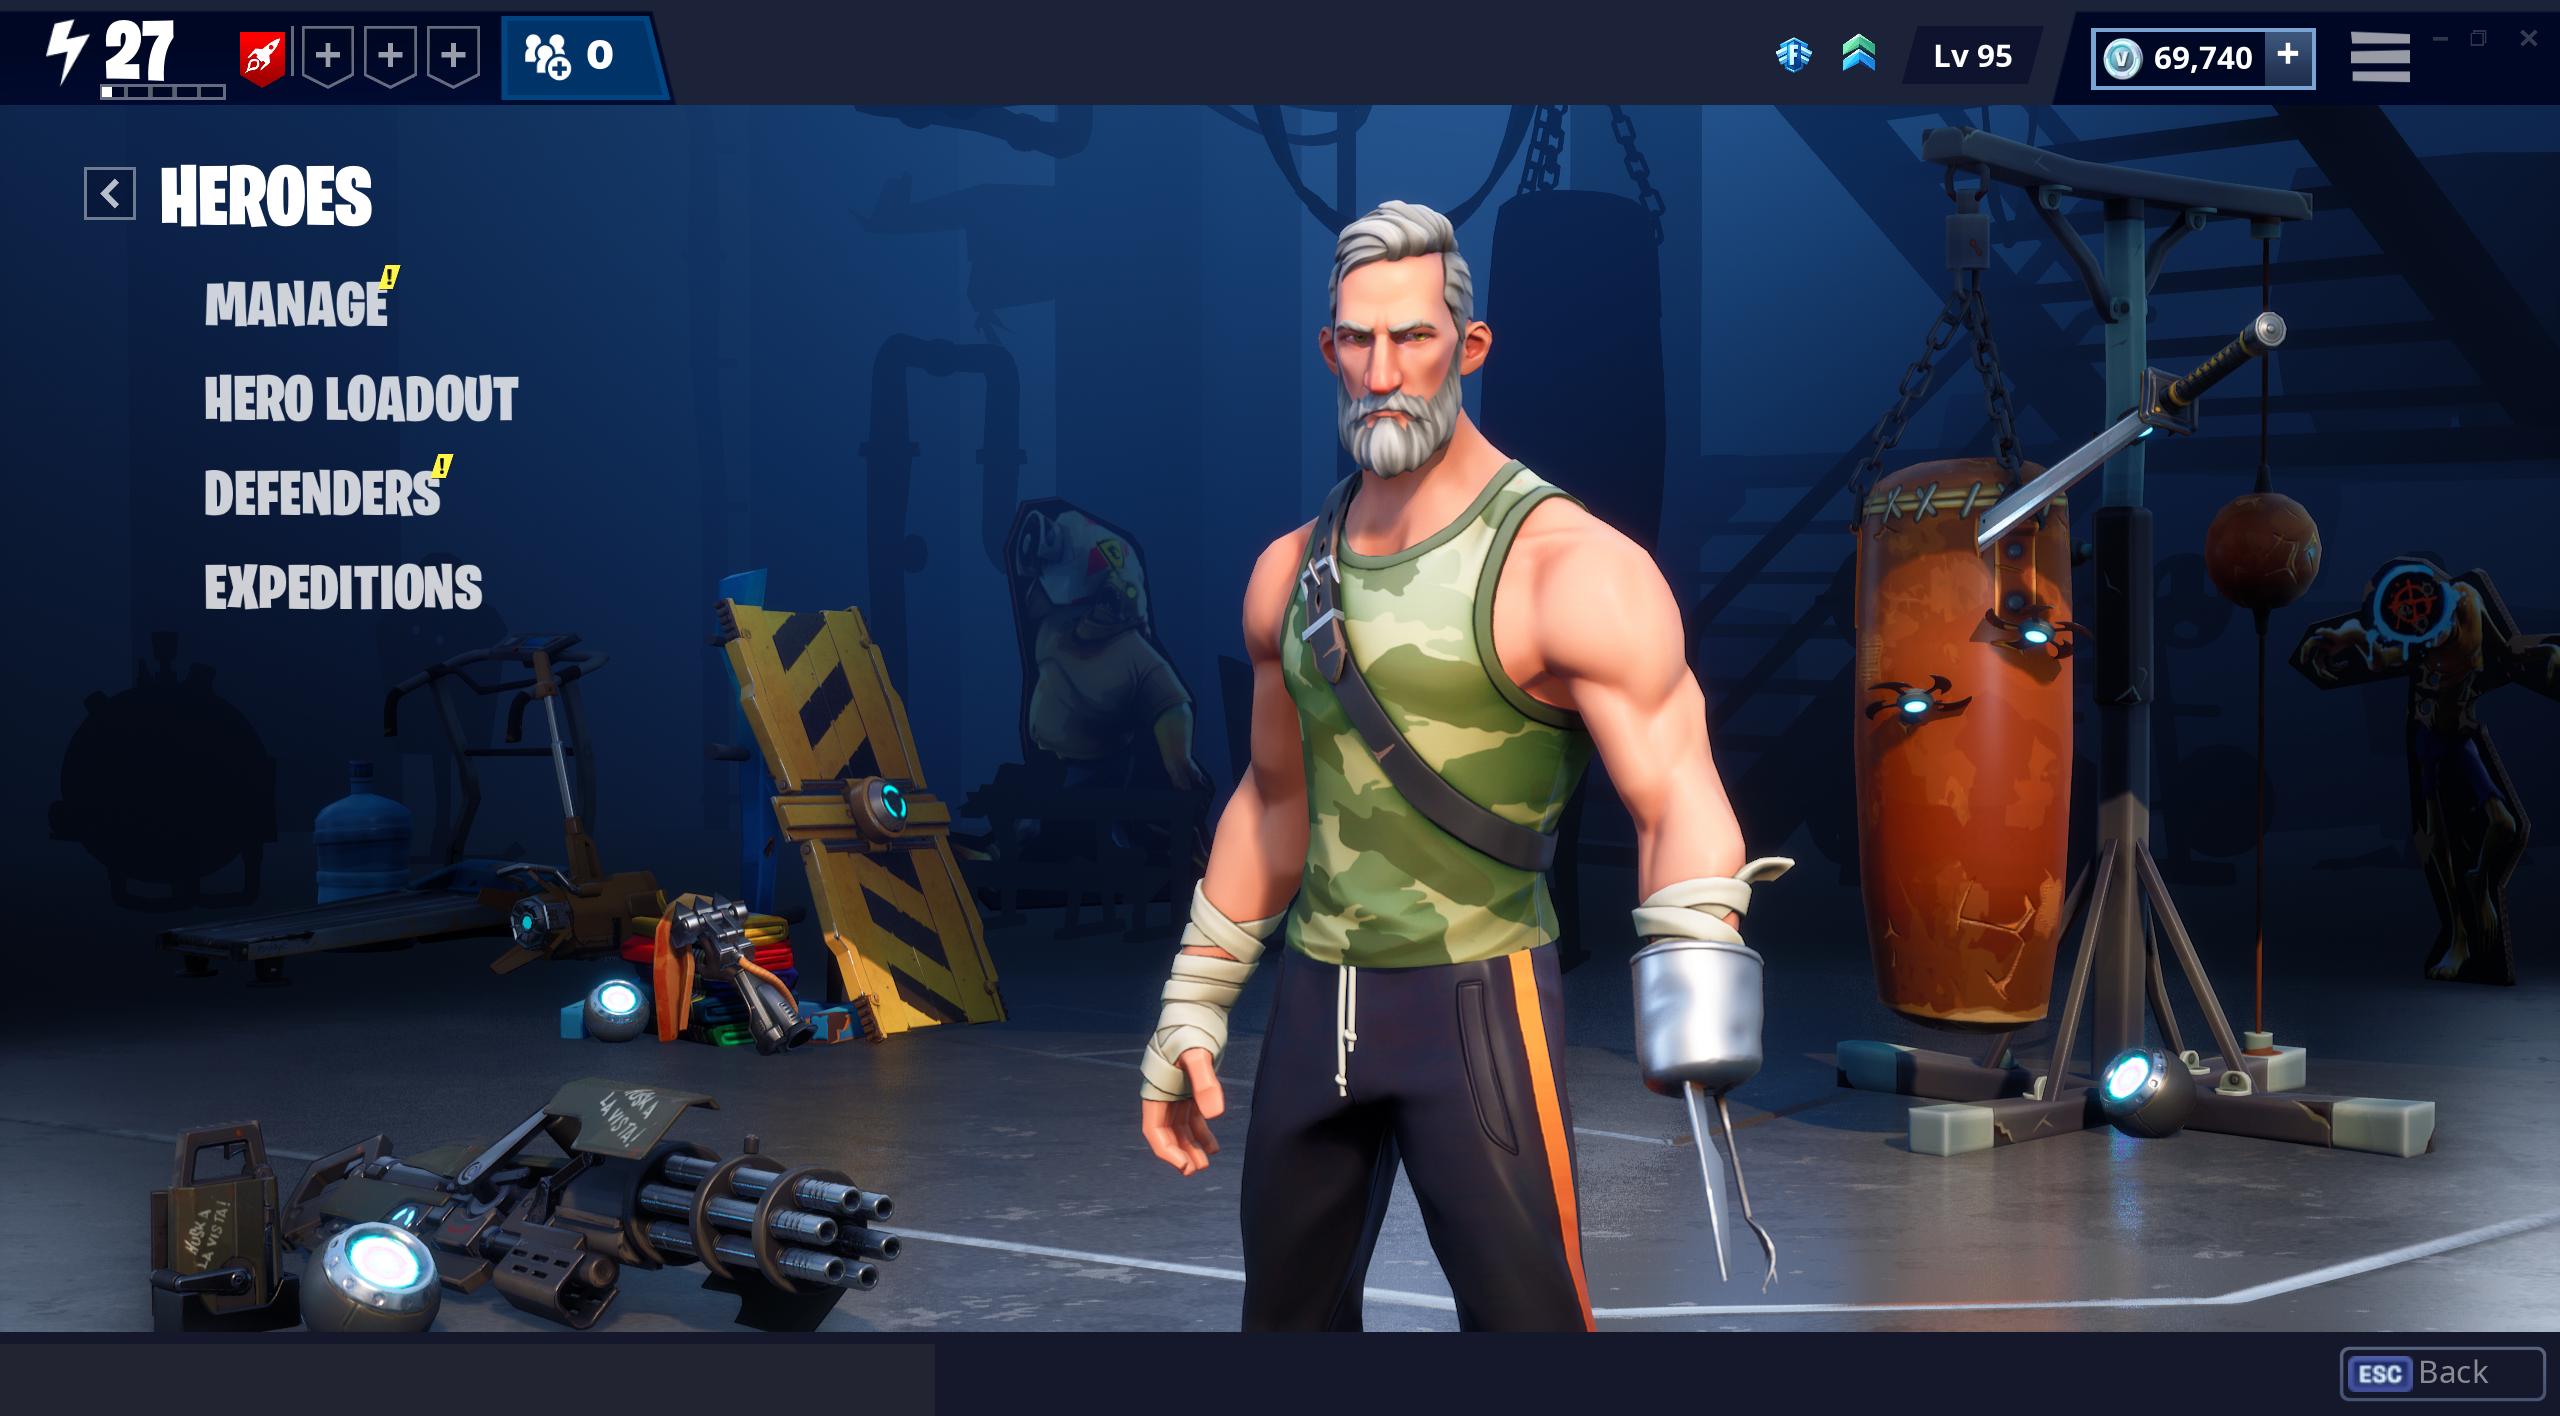 Heroes-NPC-Trainer.png